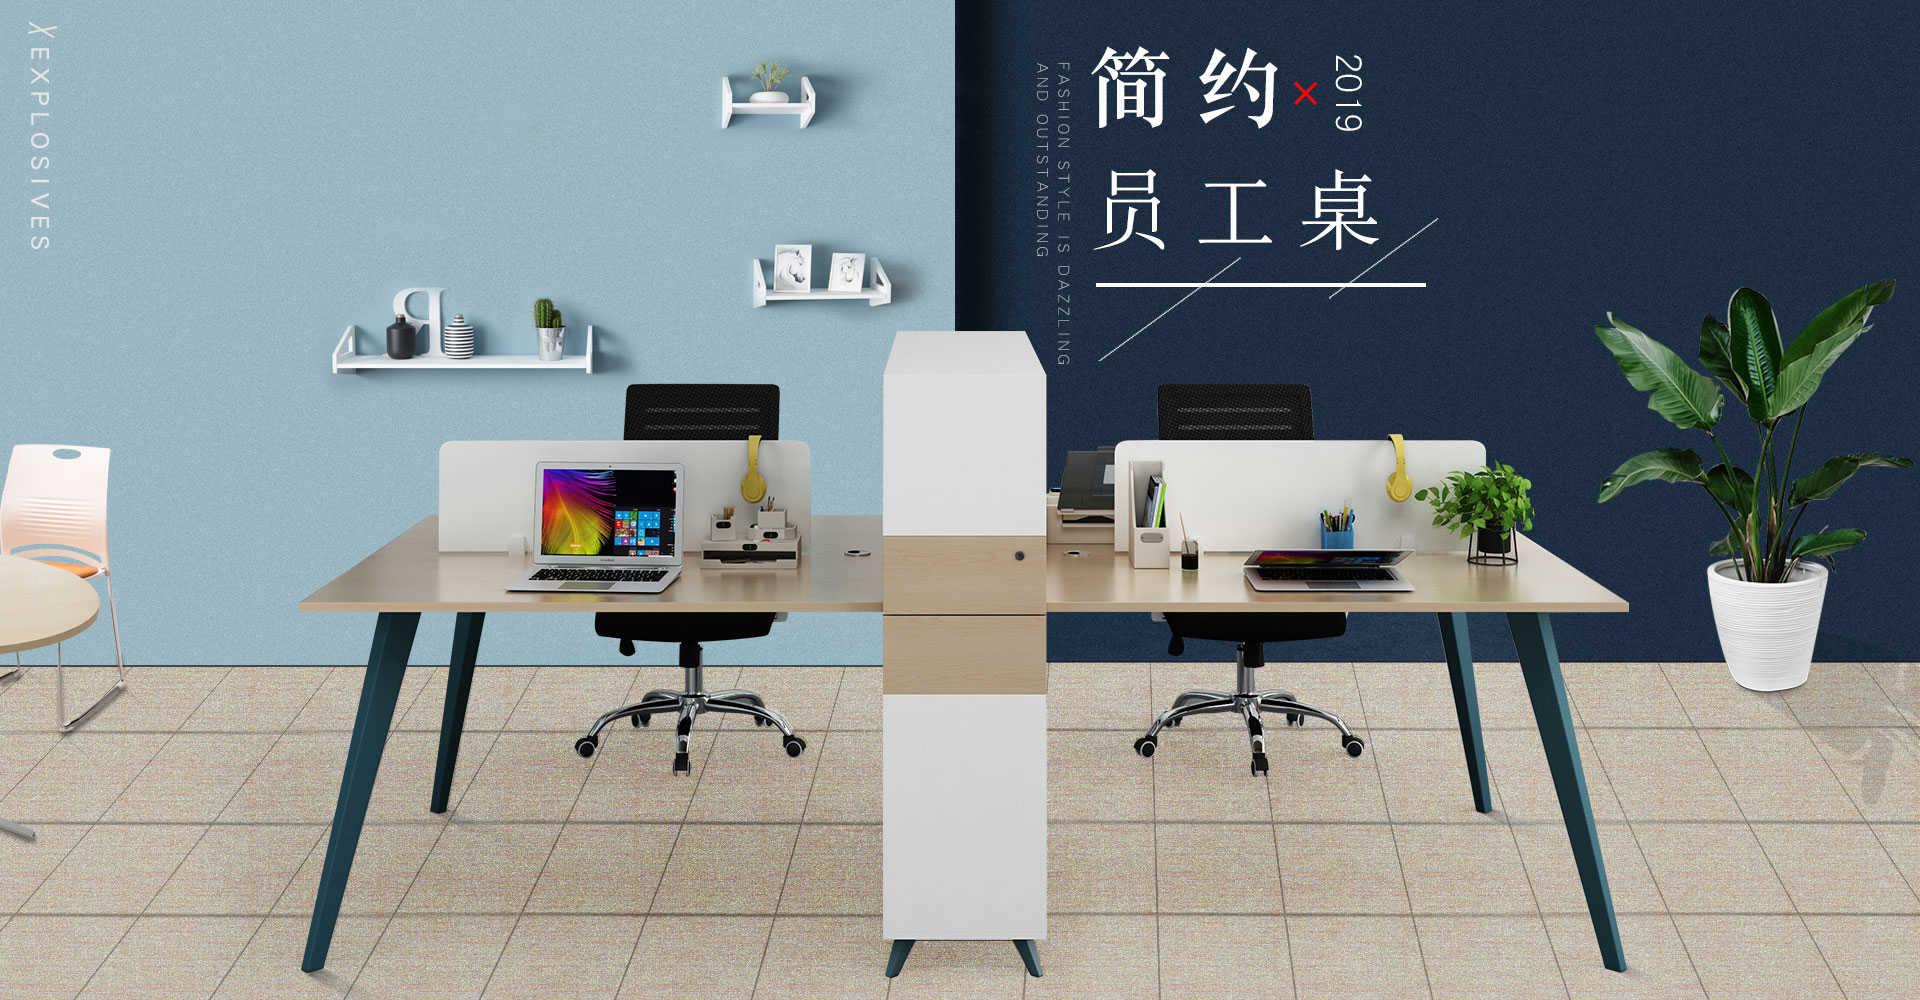 定制�k公室家具�S家,高端屏�L�k公桌